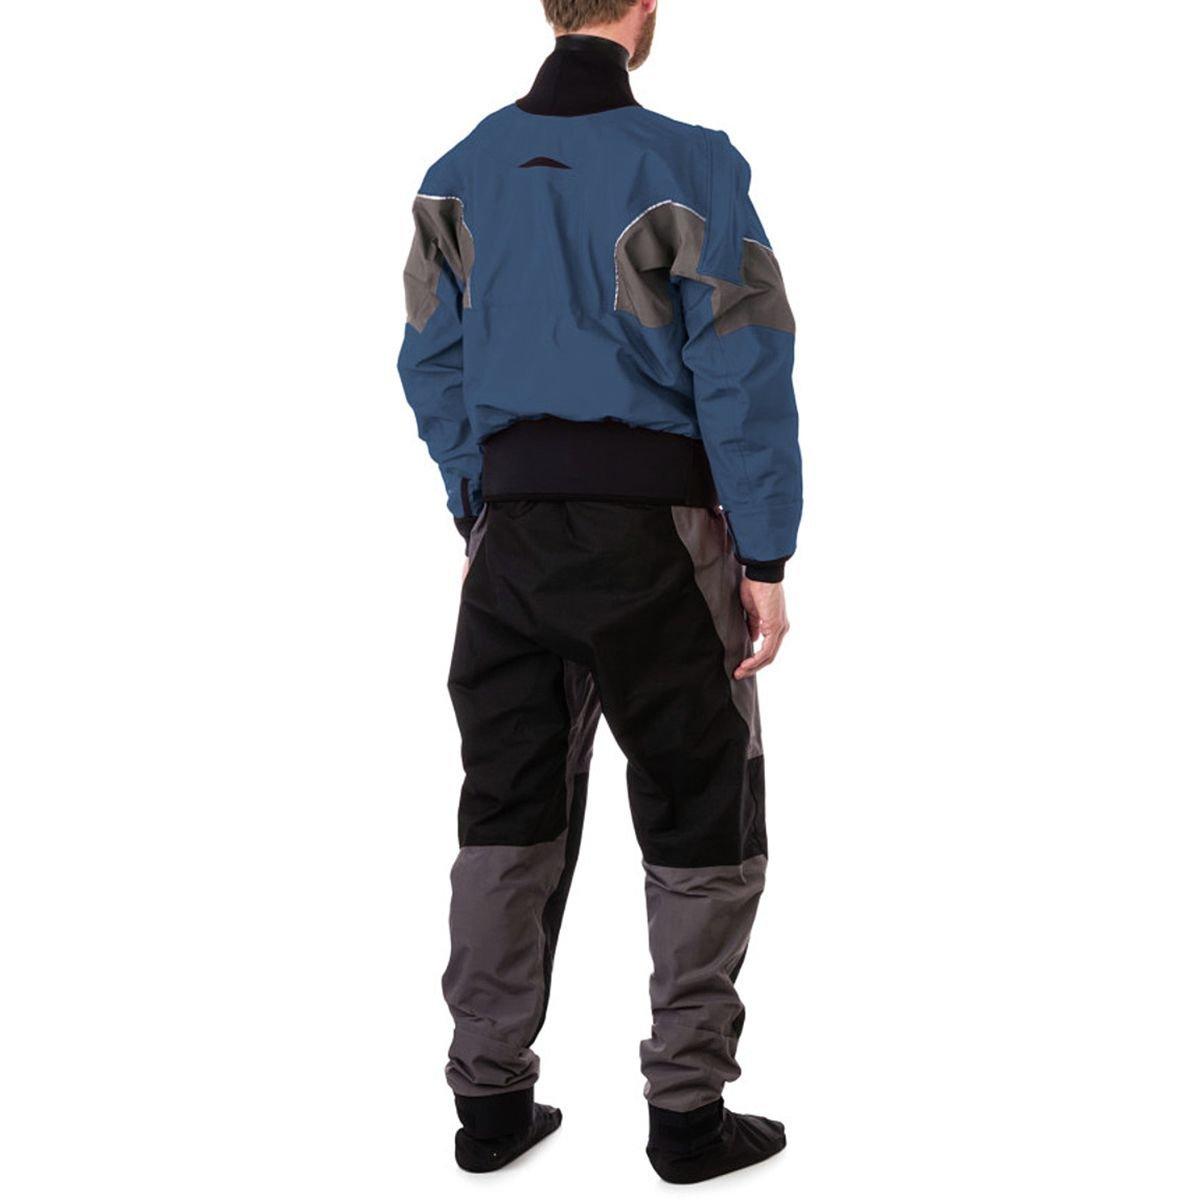 Amazon.com: kokatat Gore-Tex Meridian seco – traje de los ...